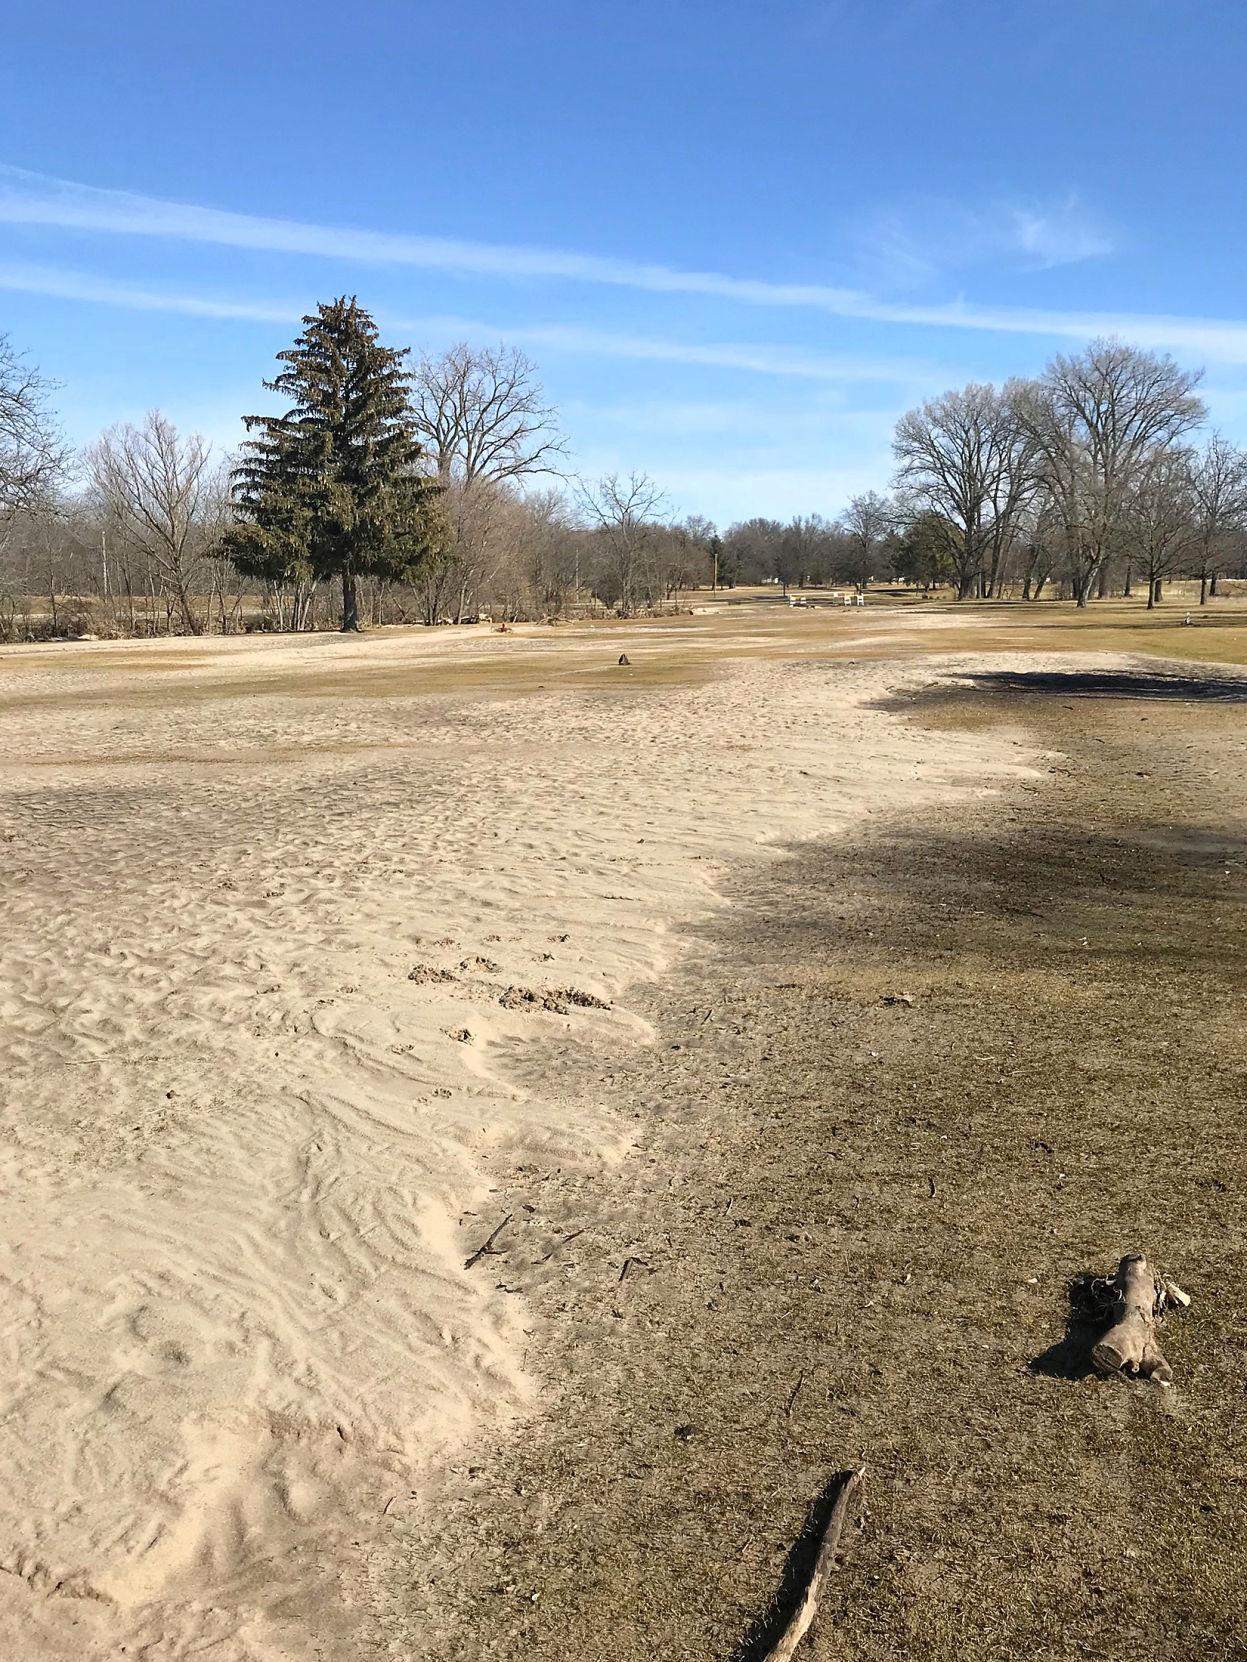 180406BLACKHAWK01 Janesvilleu0027s Blackhawk Golf Course still recovering